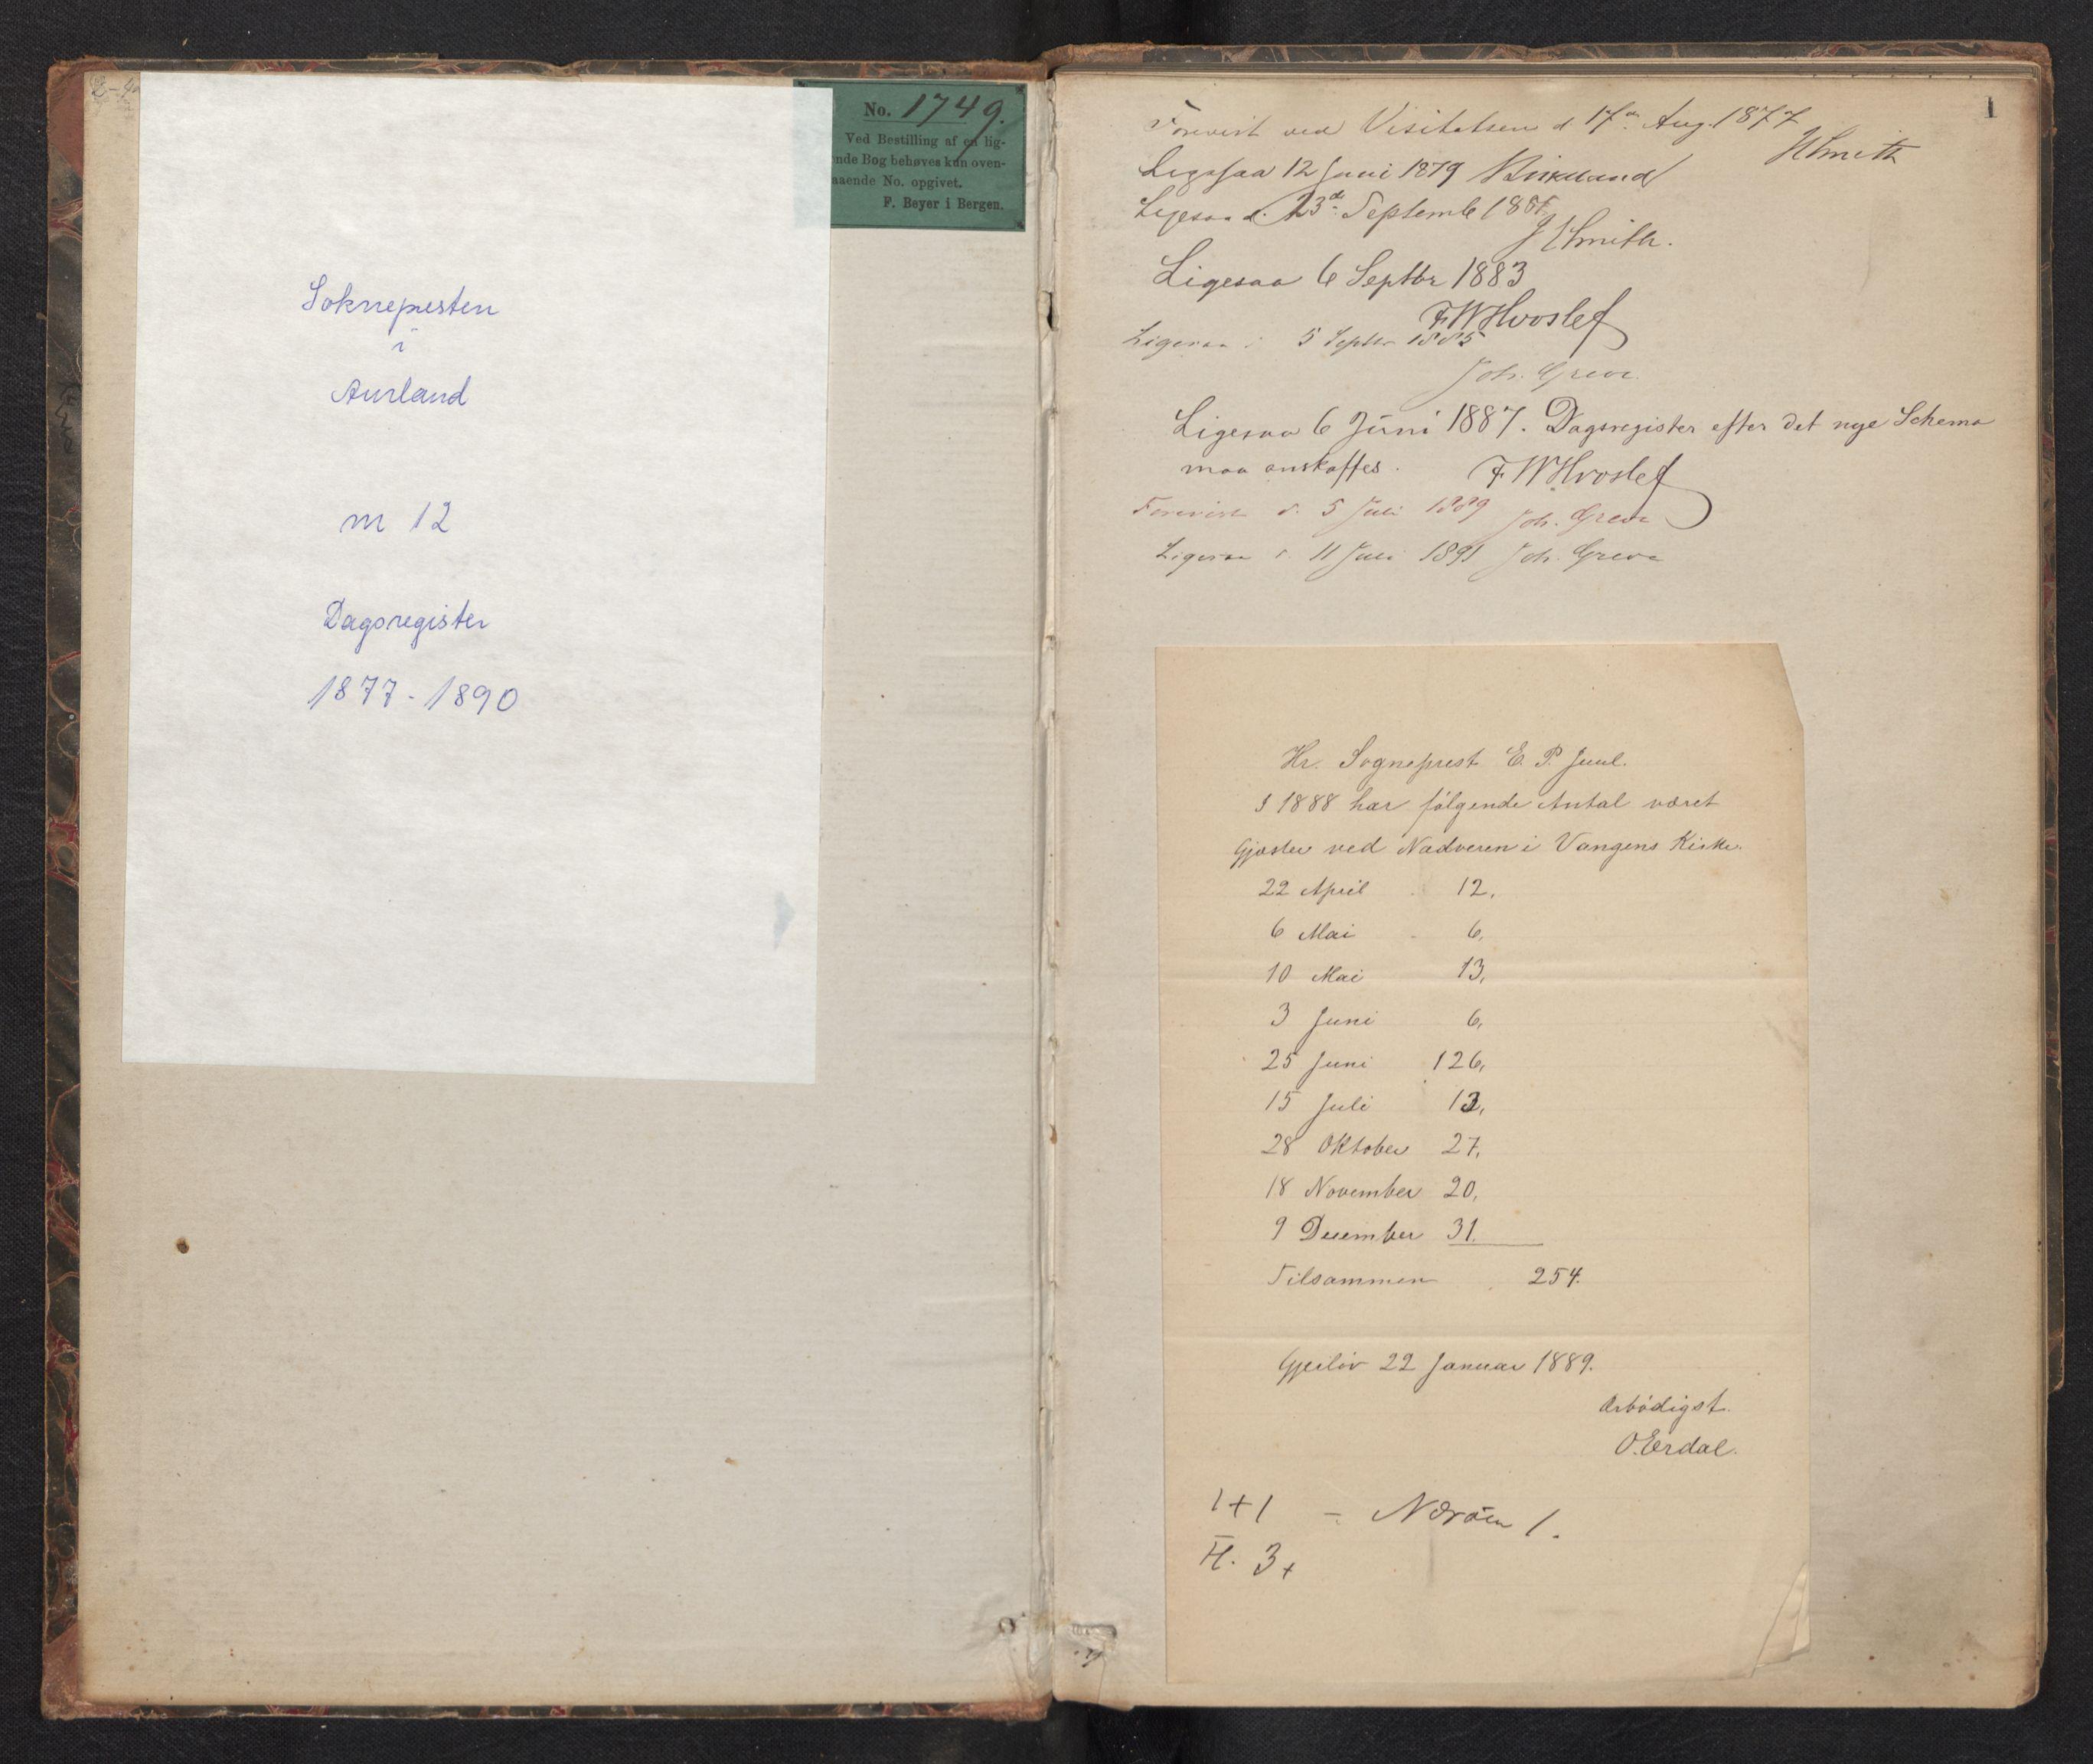 SAB, Aurland Sokneprestembete*, Dagregister nr. F 1, 1877-1890, s. 0b-1a